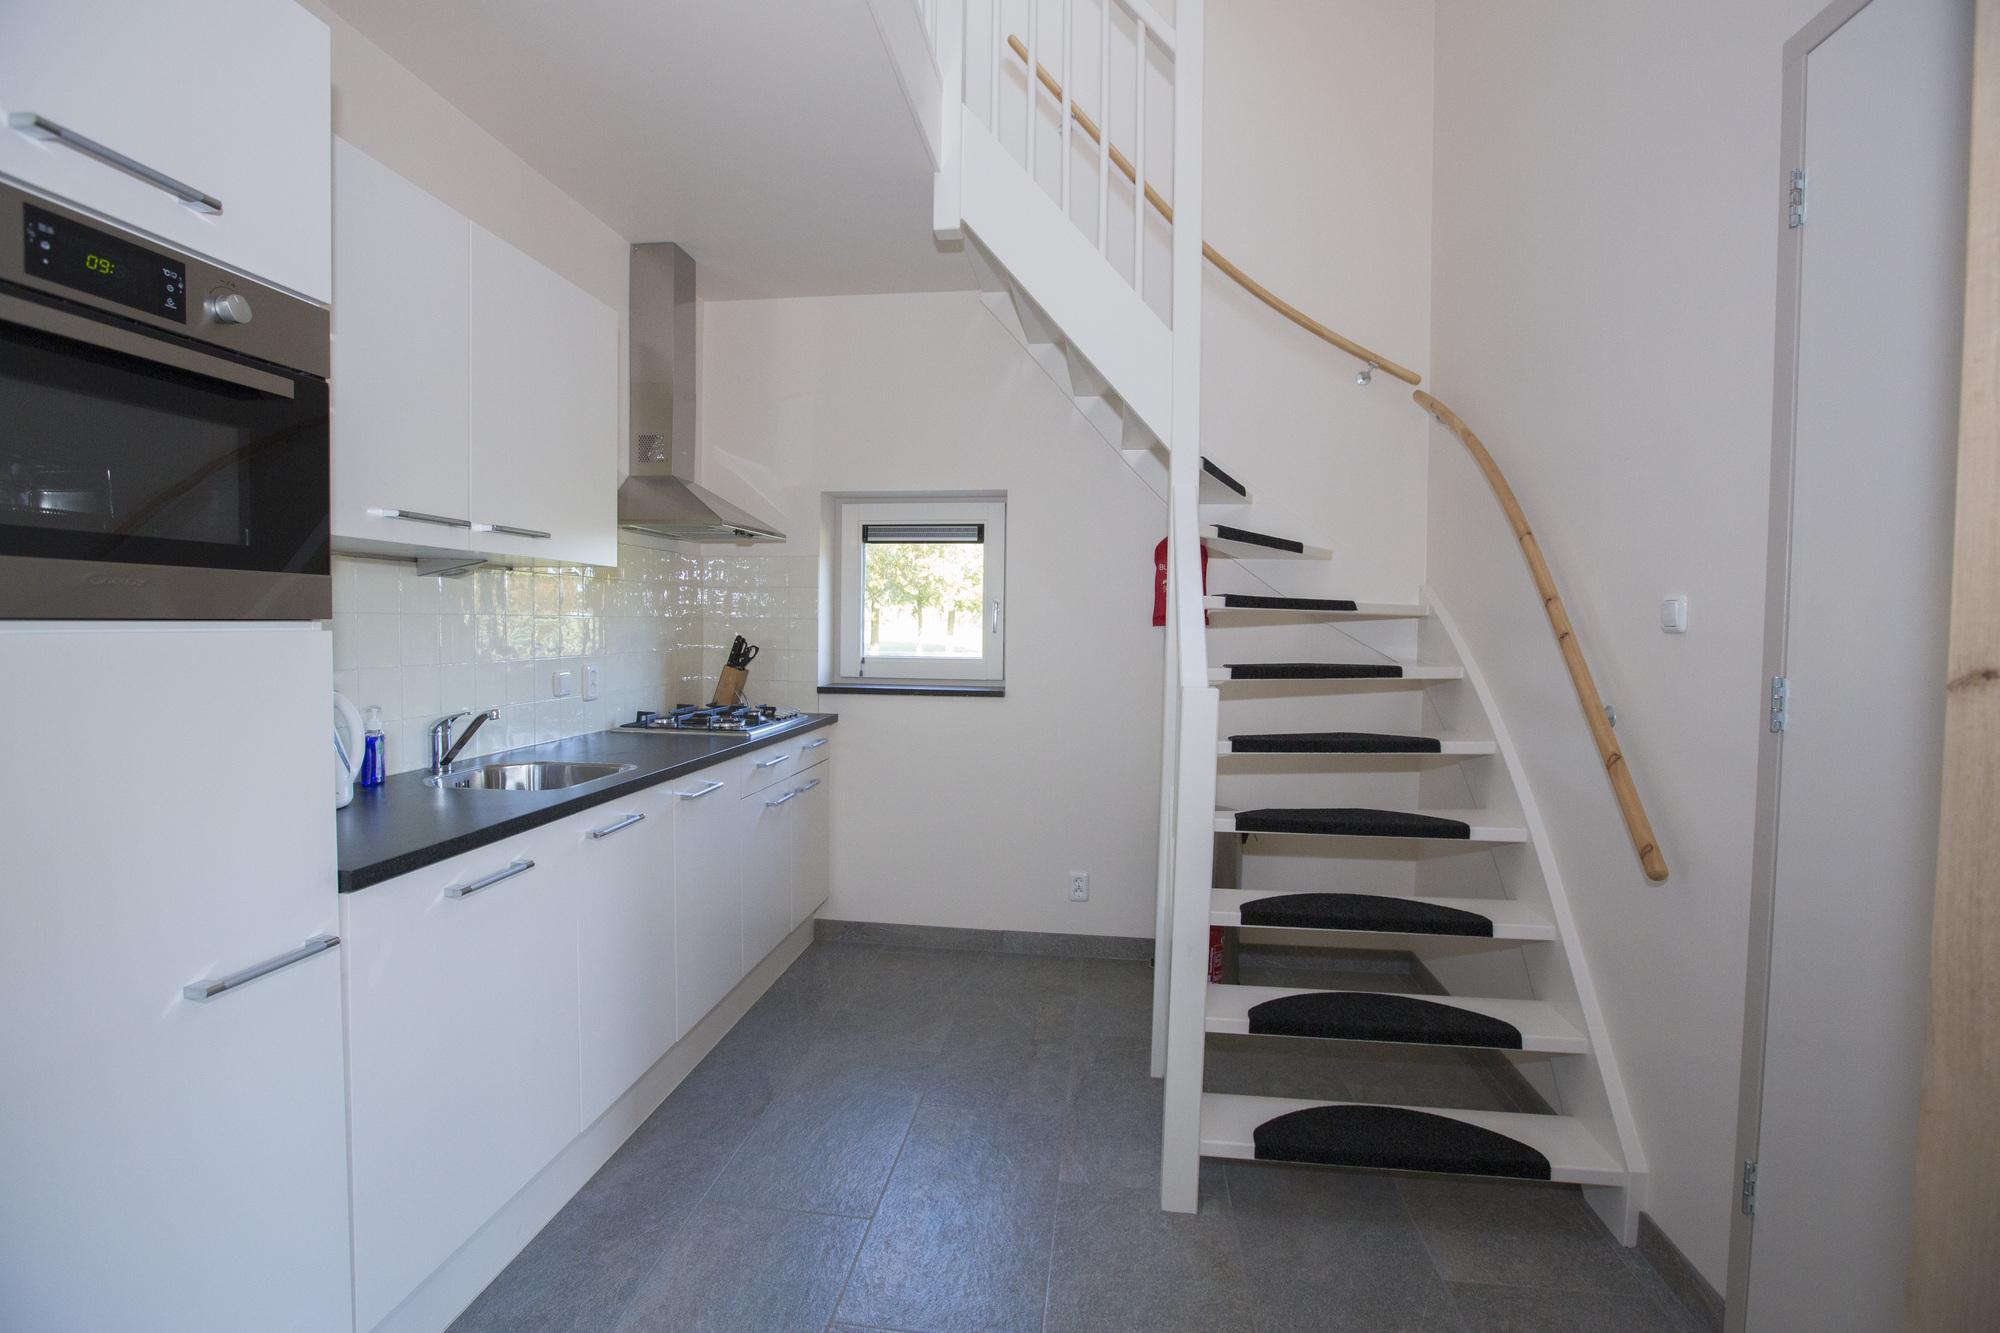 Keuken Met Trap : Trap kastenwand en keuken maakwerk maakwerk